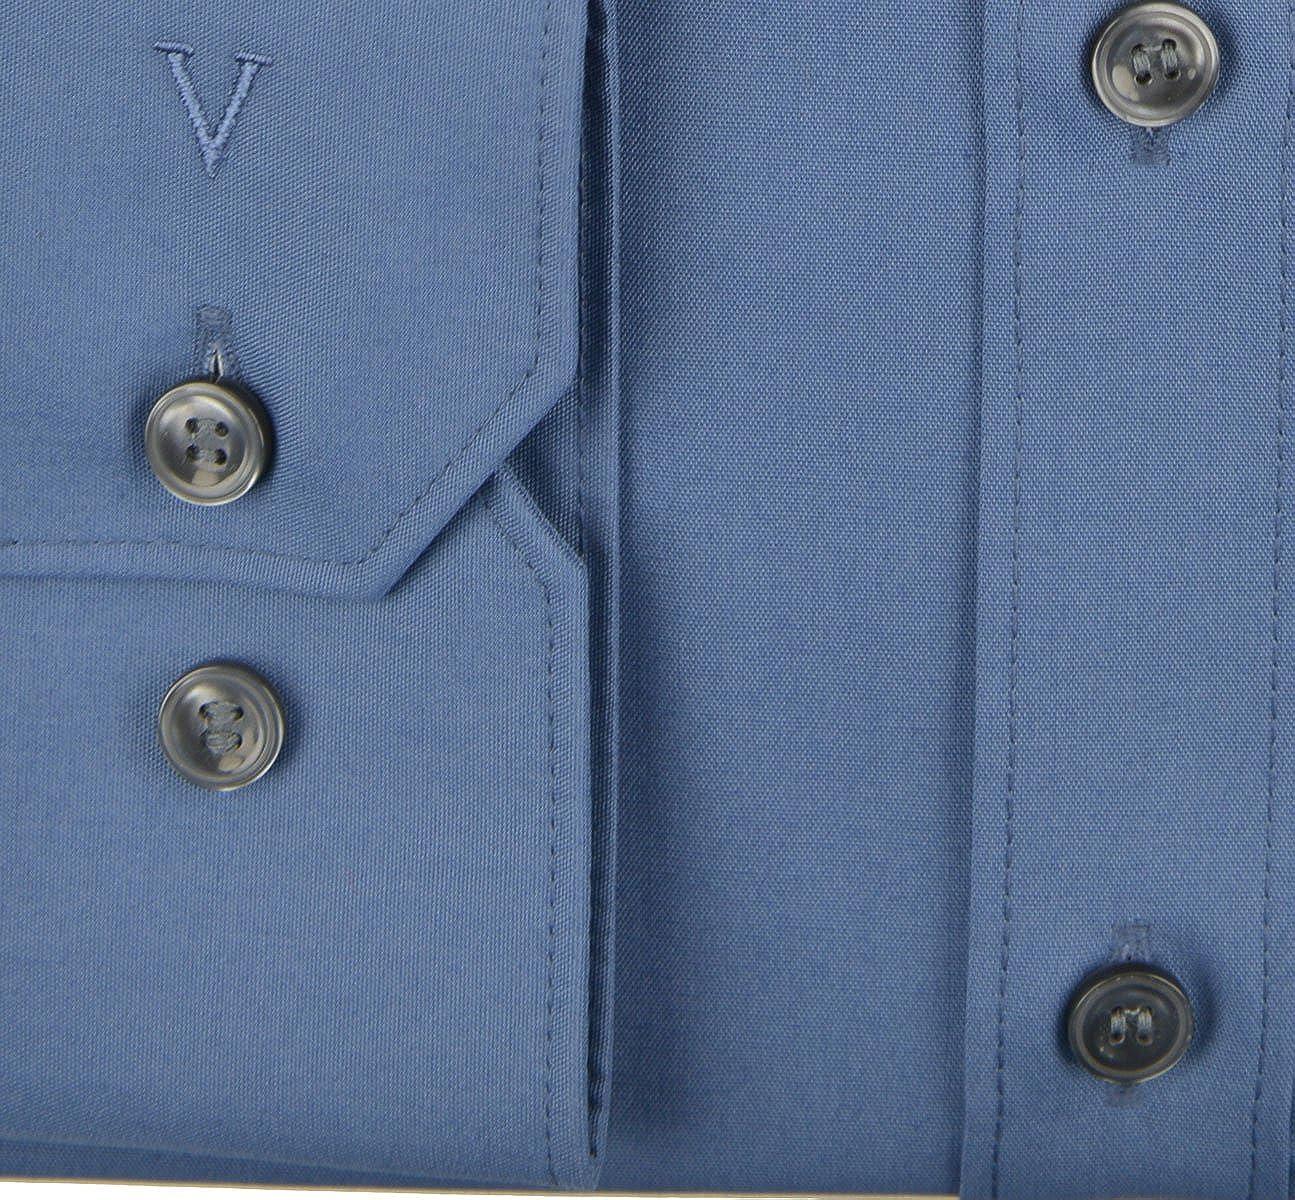 Marvelis Camisa Body Fit manga larga f/ácil de planchar 41 azul cielo Azul ahumado